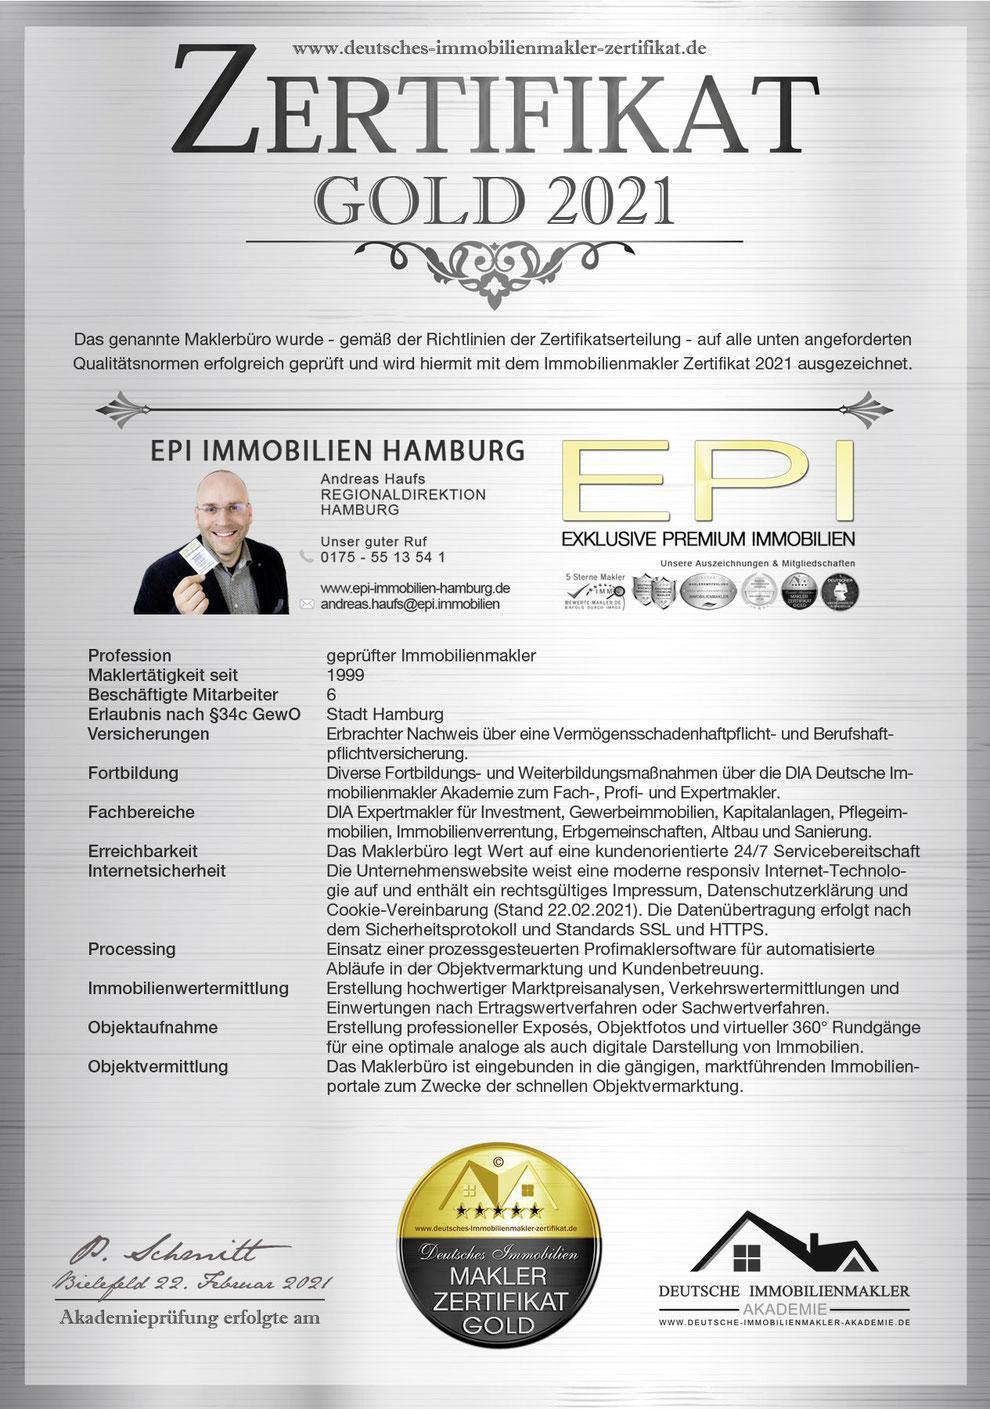 IMMOBILIENMAKLER HAMBURG OSTSEE KIEL MAKLER ZERTIFIKAT MAKLER ZERTIFIZIERUNG ANDREAS HAUFS MAKLERZERTIFIKAT IHK MAKLEREMPFEHLUNG HAMBURG